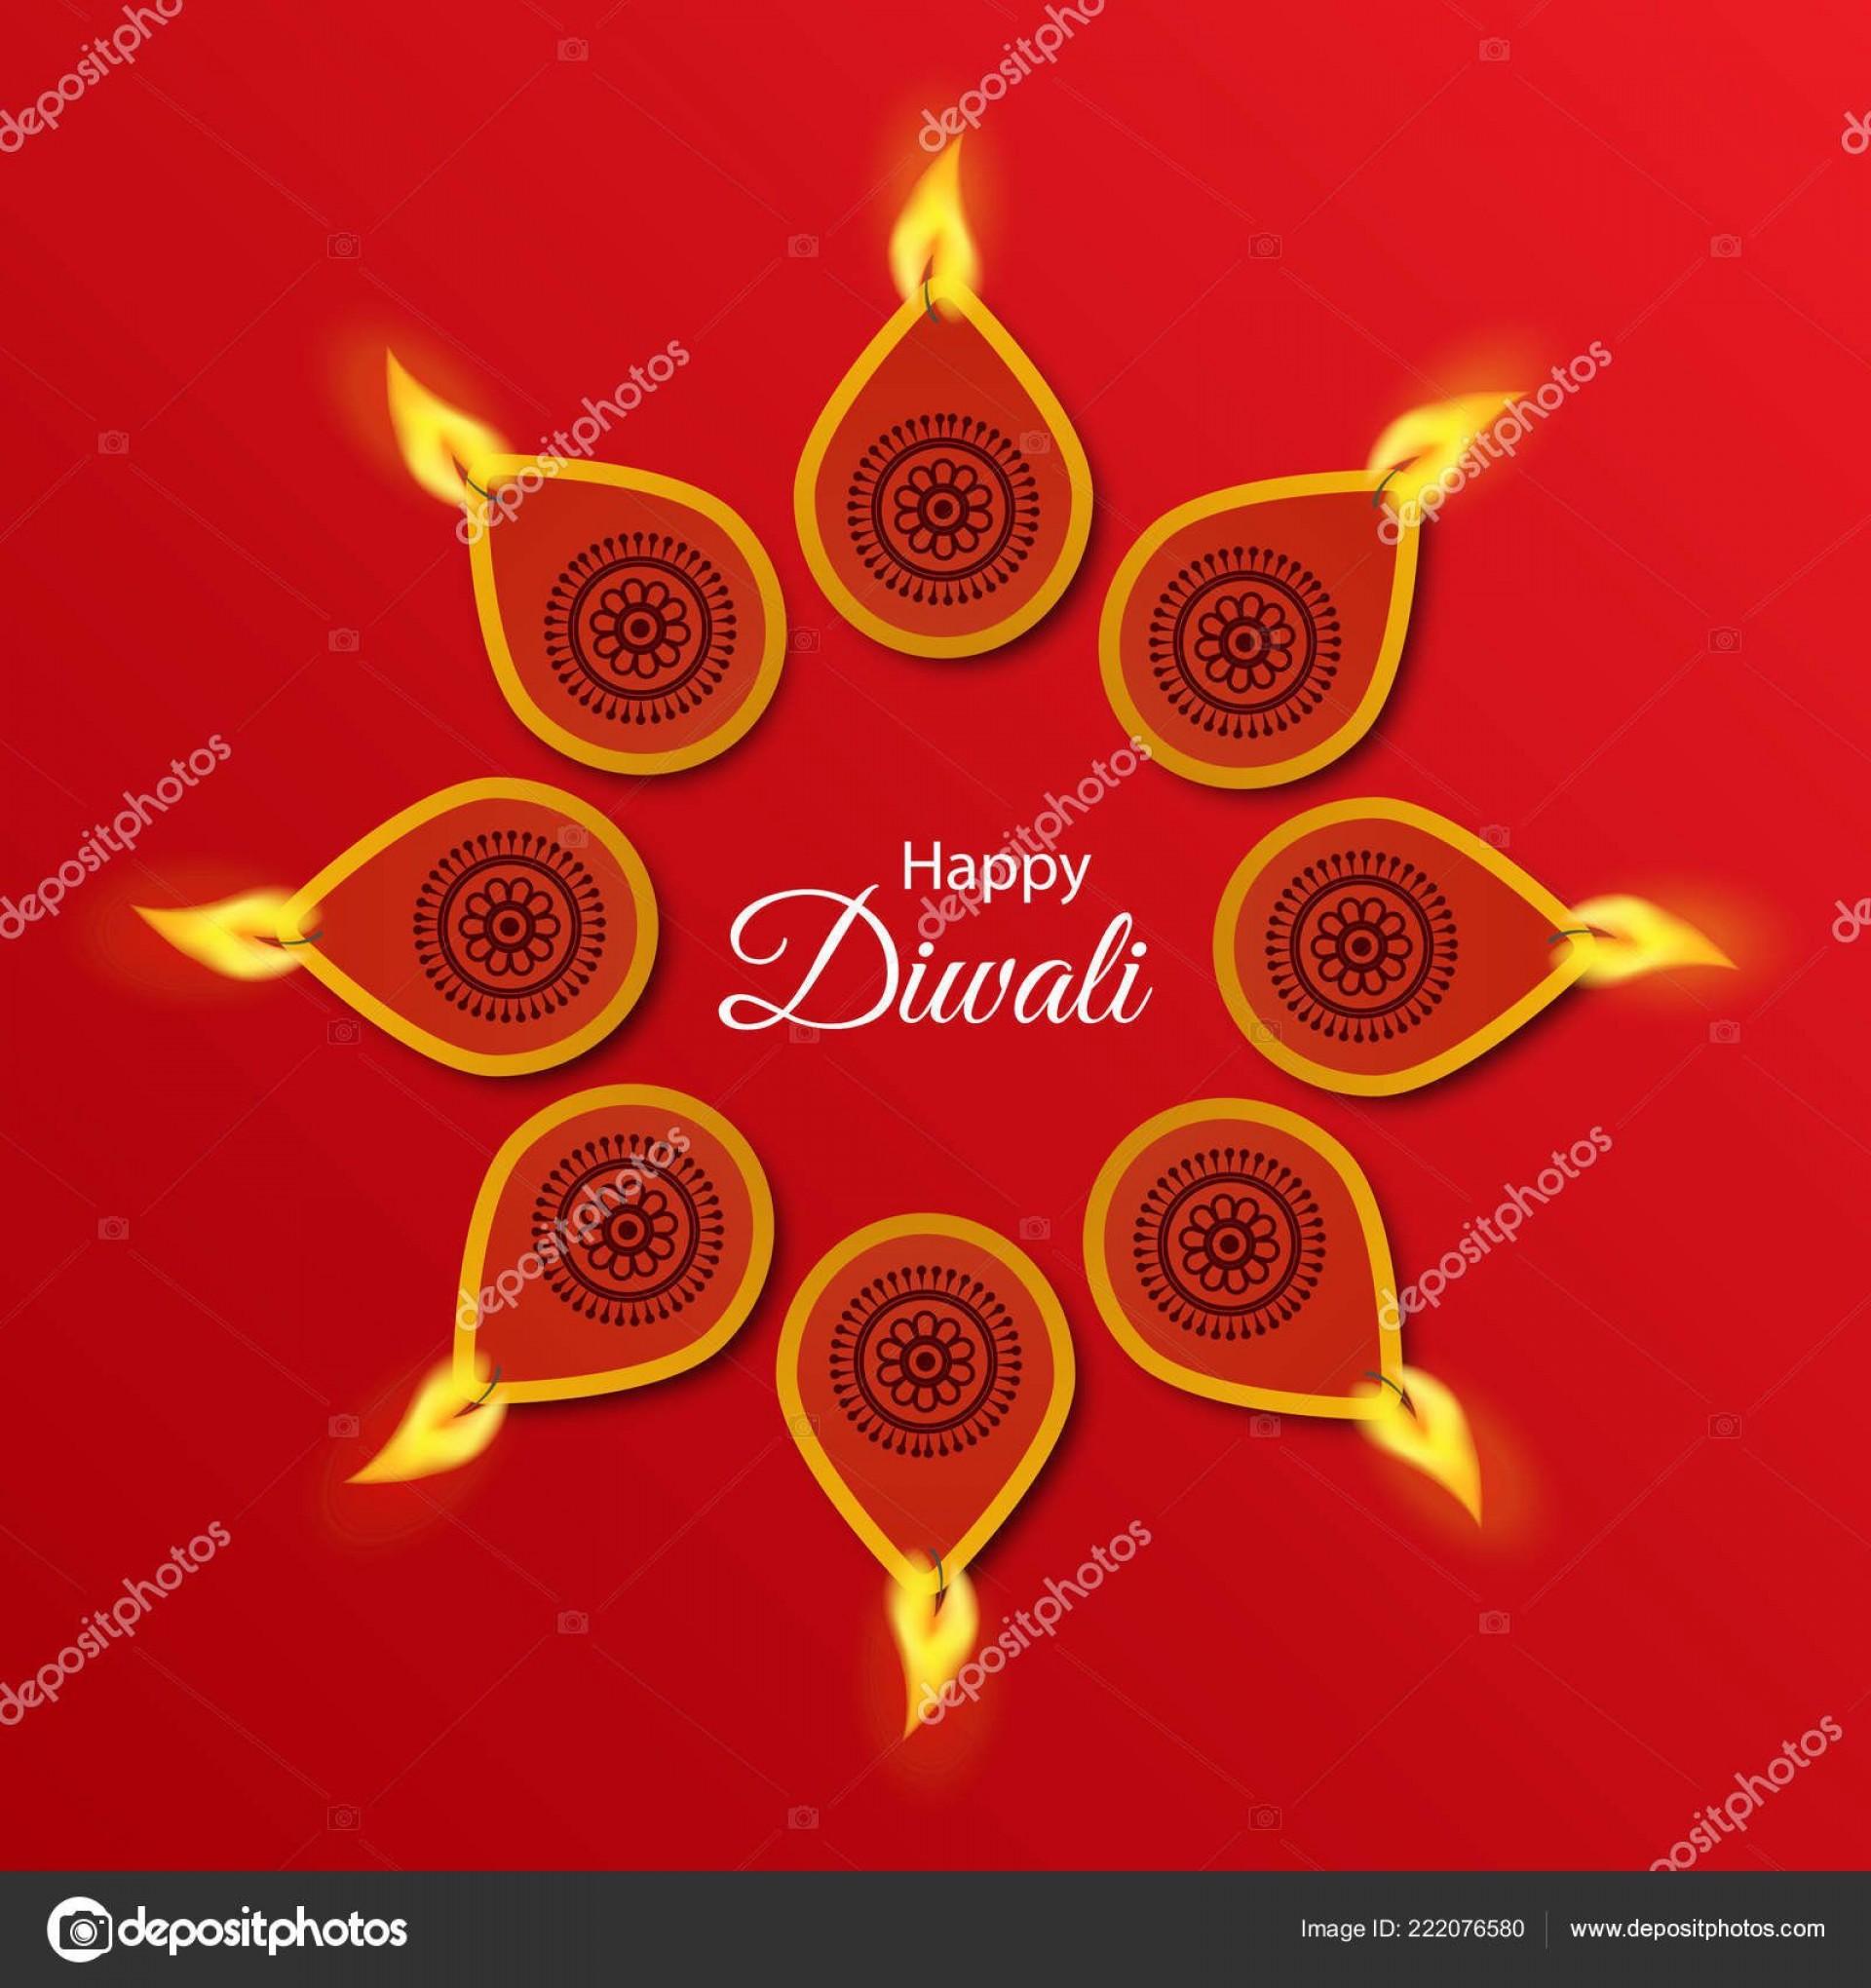 003 Phenomenal Diwali Party Invite Template Free Photo 1920